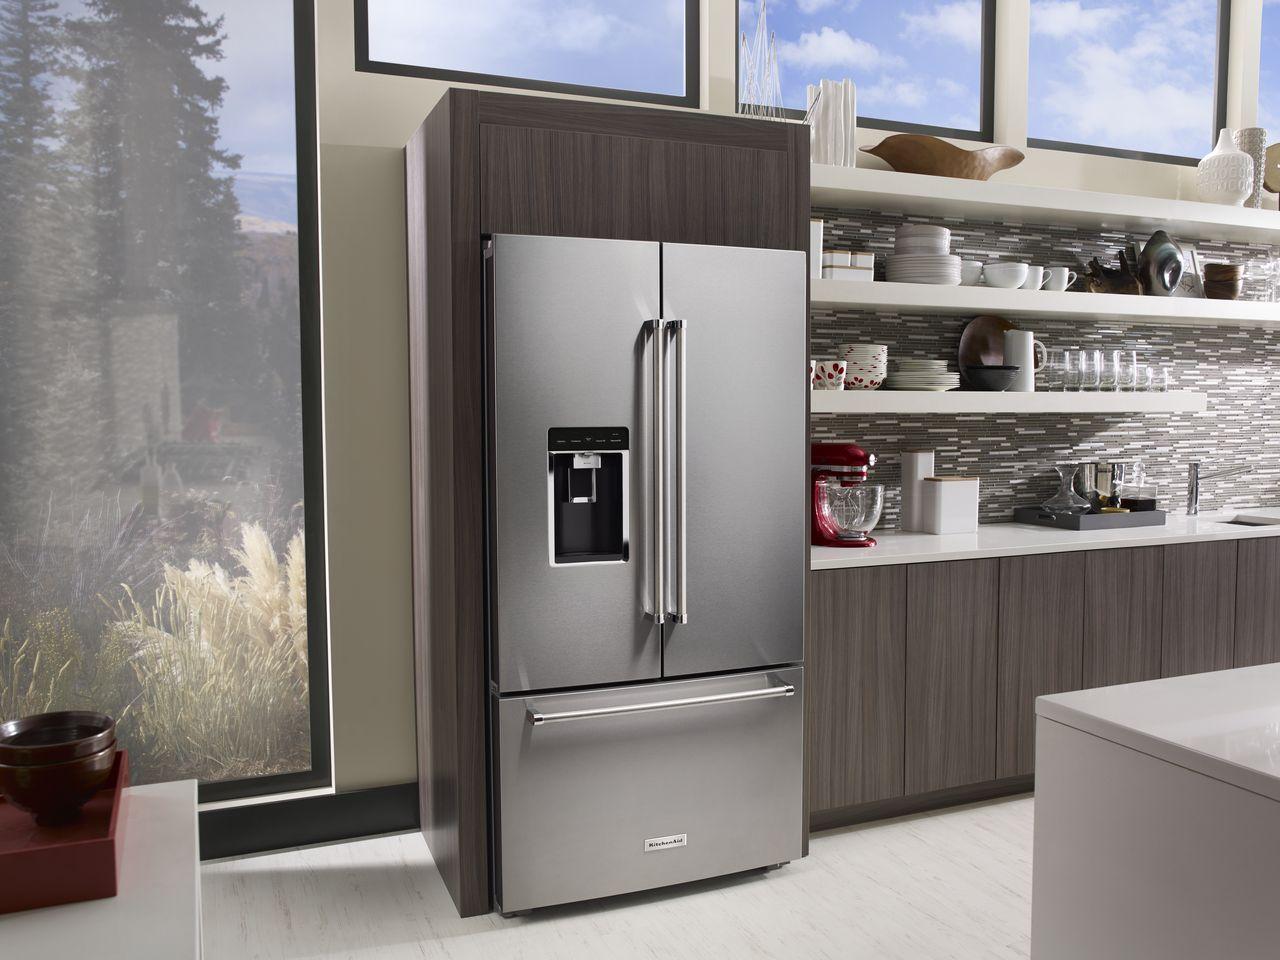 The Big Three Door Fridge By Kitchenaid Home Appliances